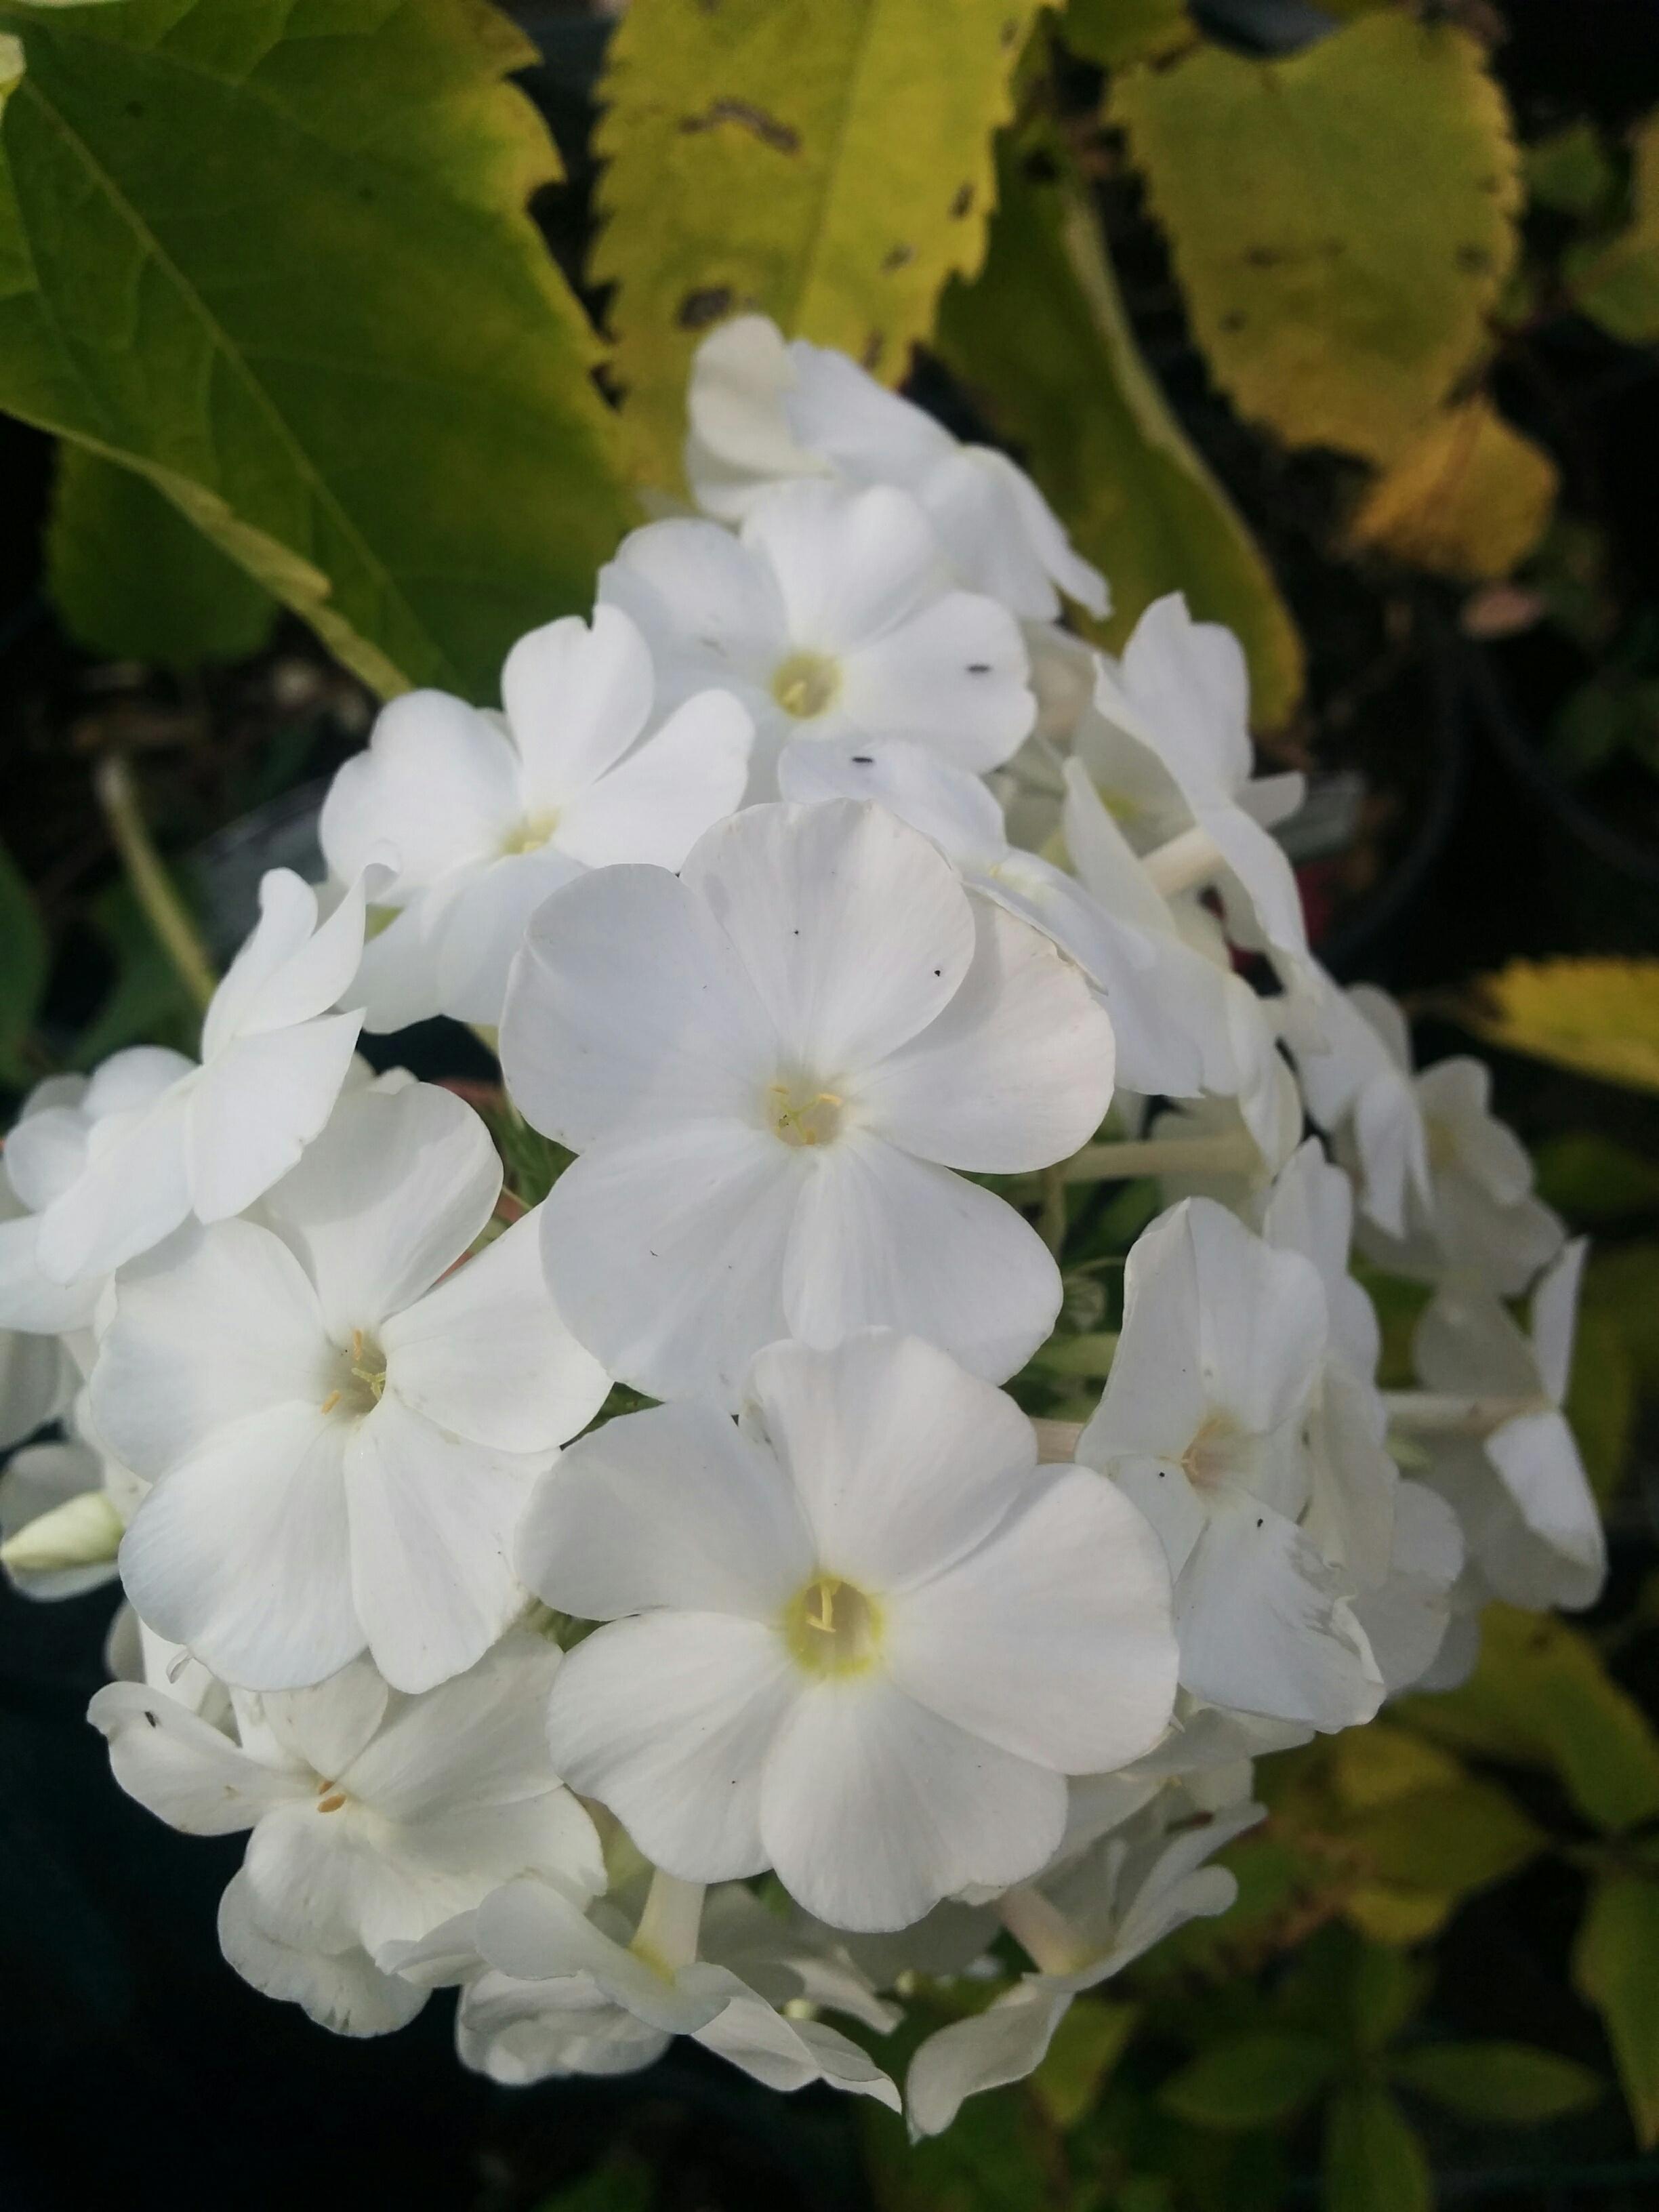 David Phlox Flower Close Up